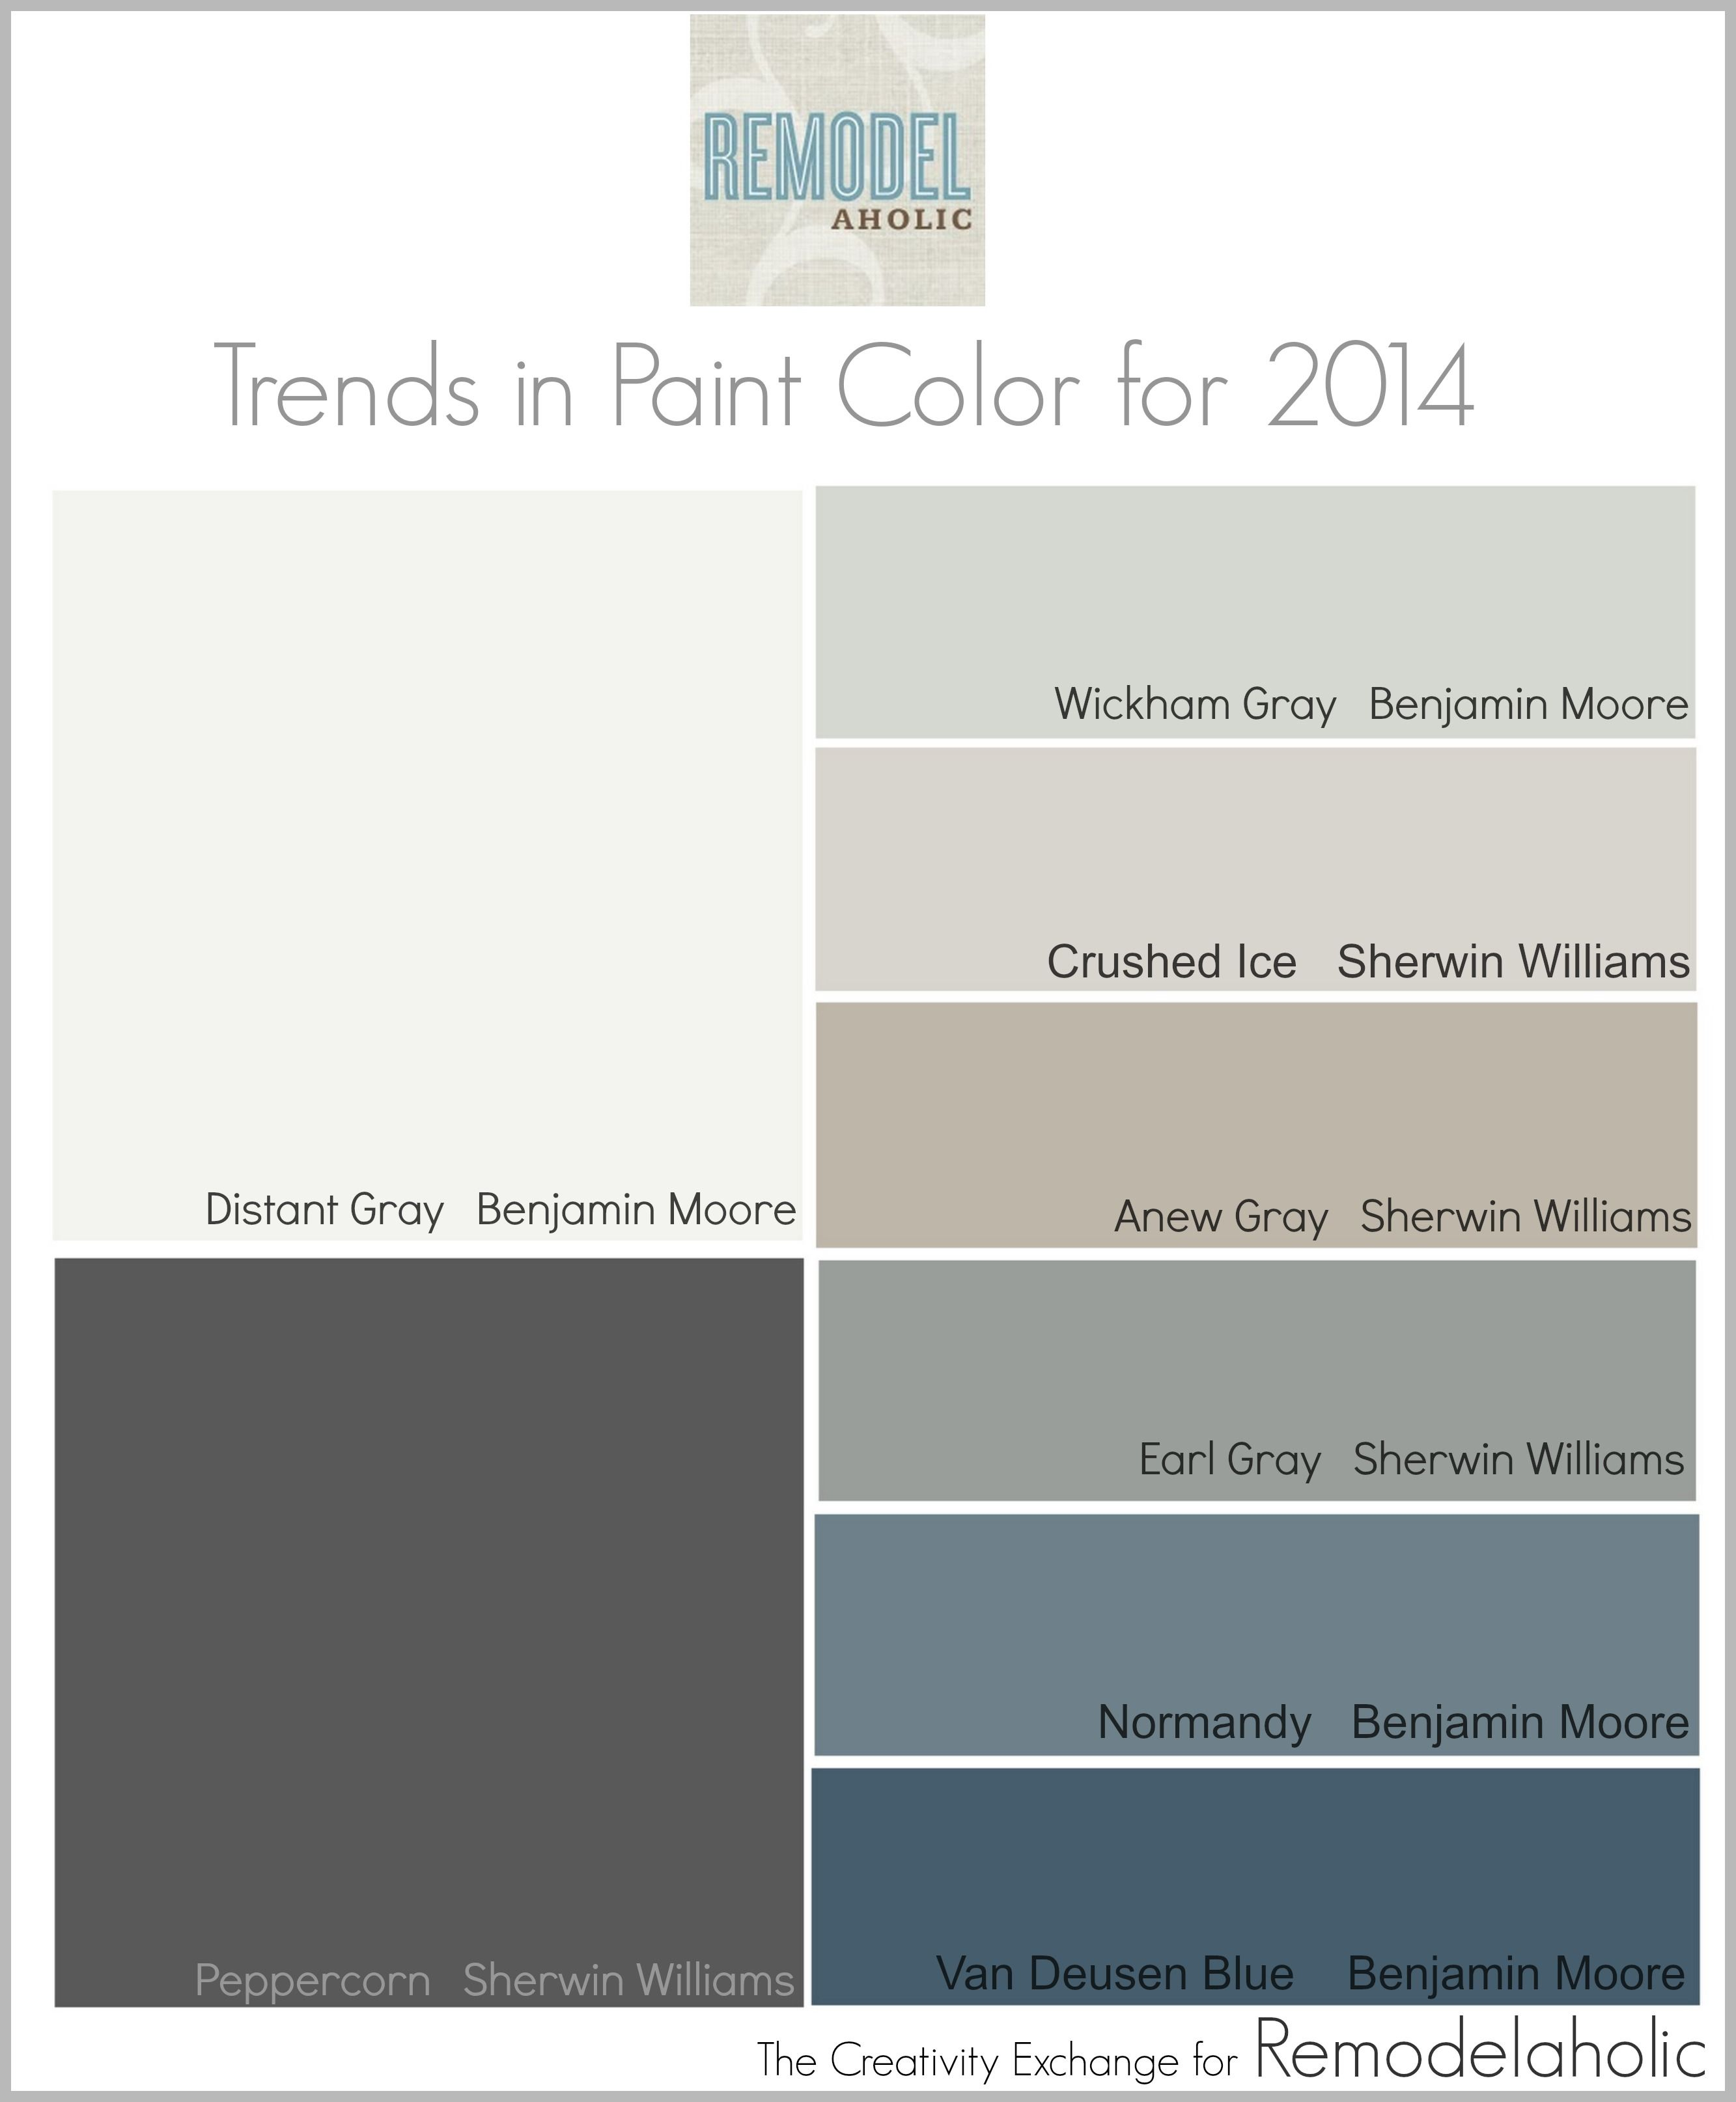 New Decor Ideas for 2014